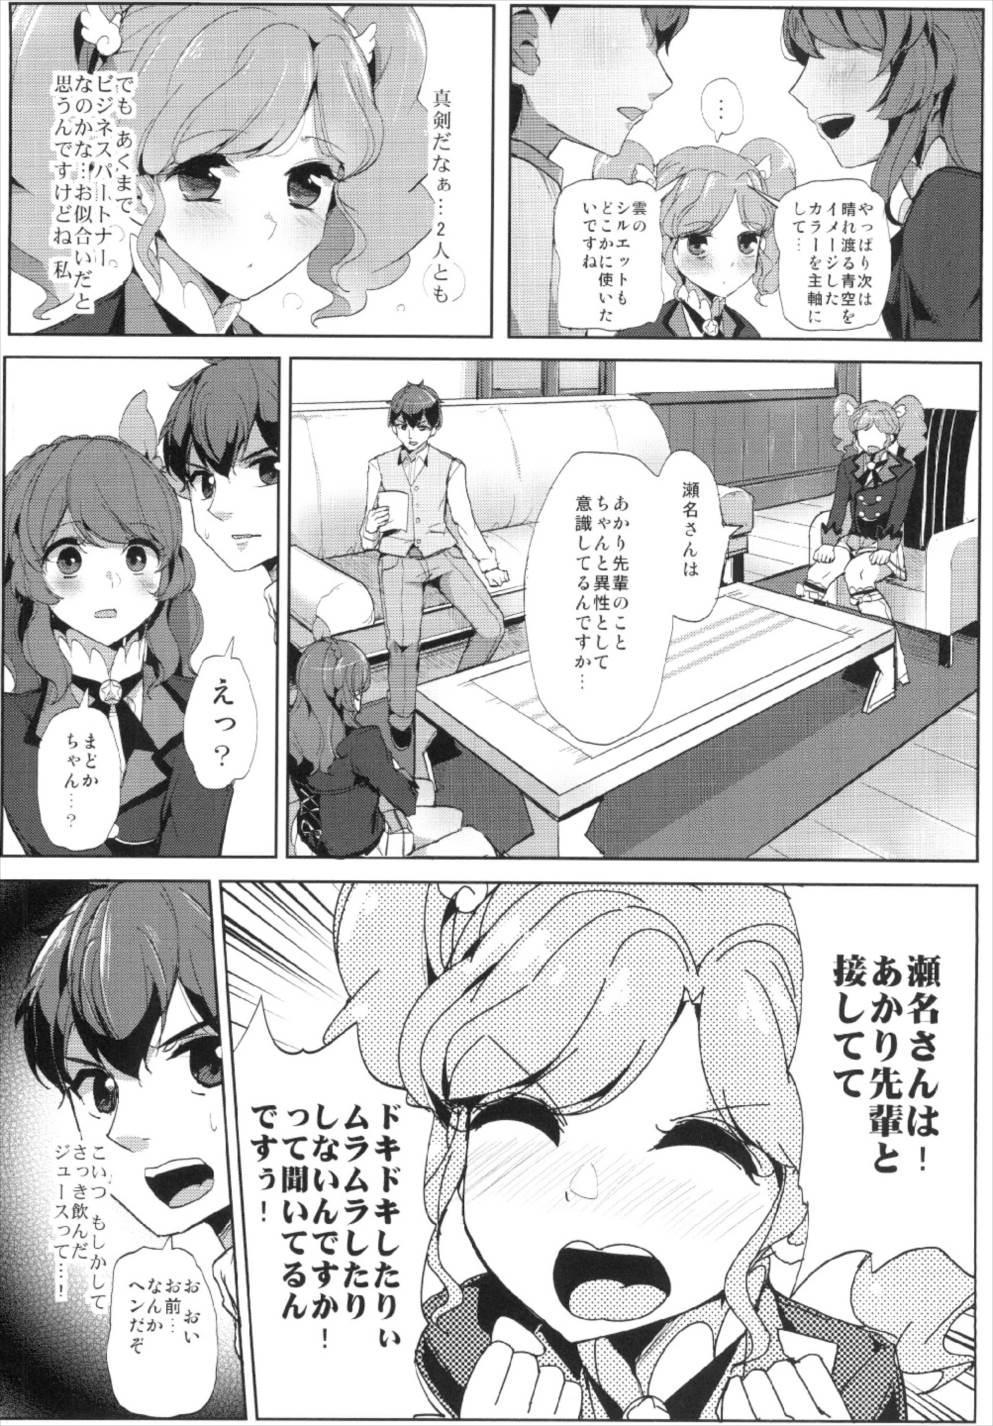 Sena-san Saitte Desu♥ 3